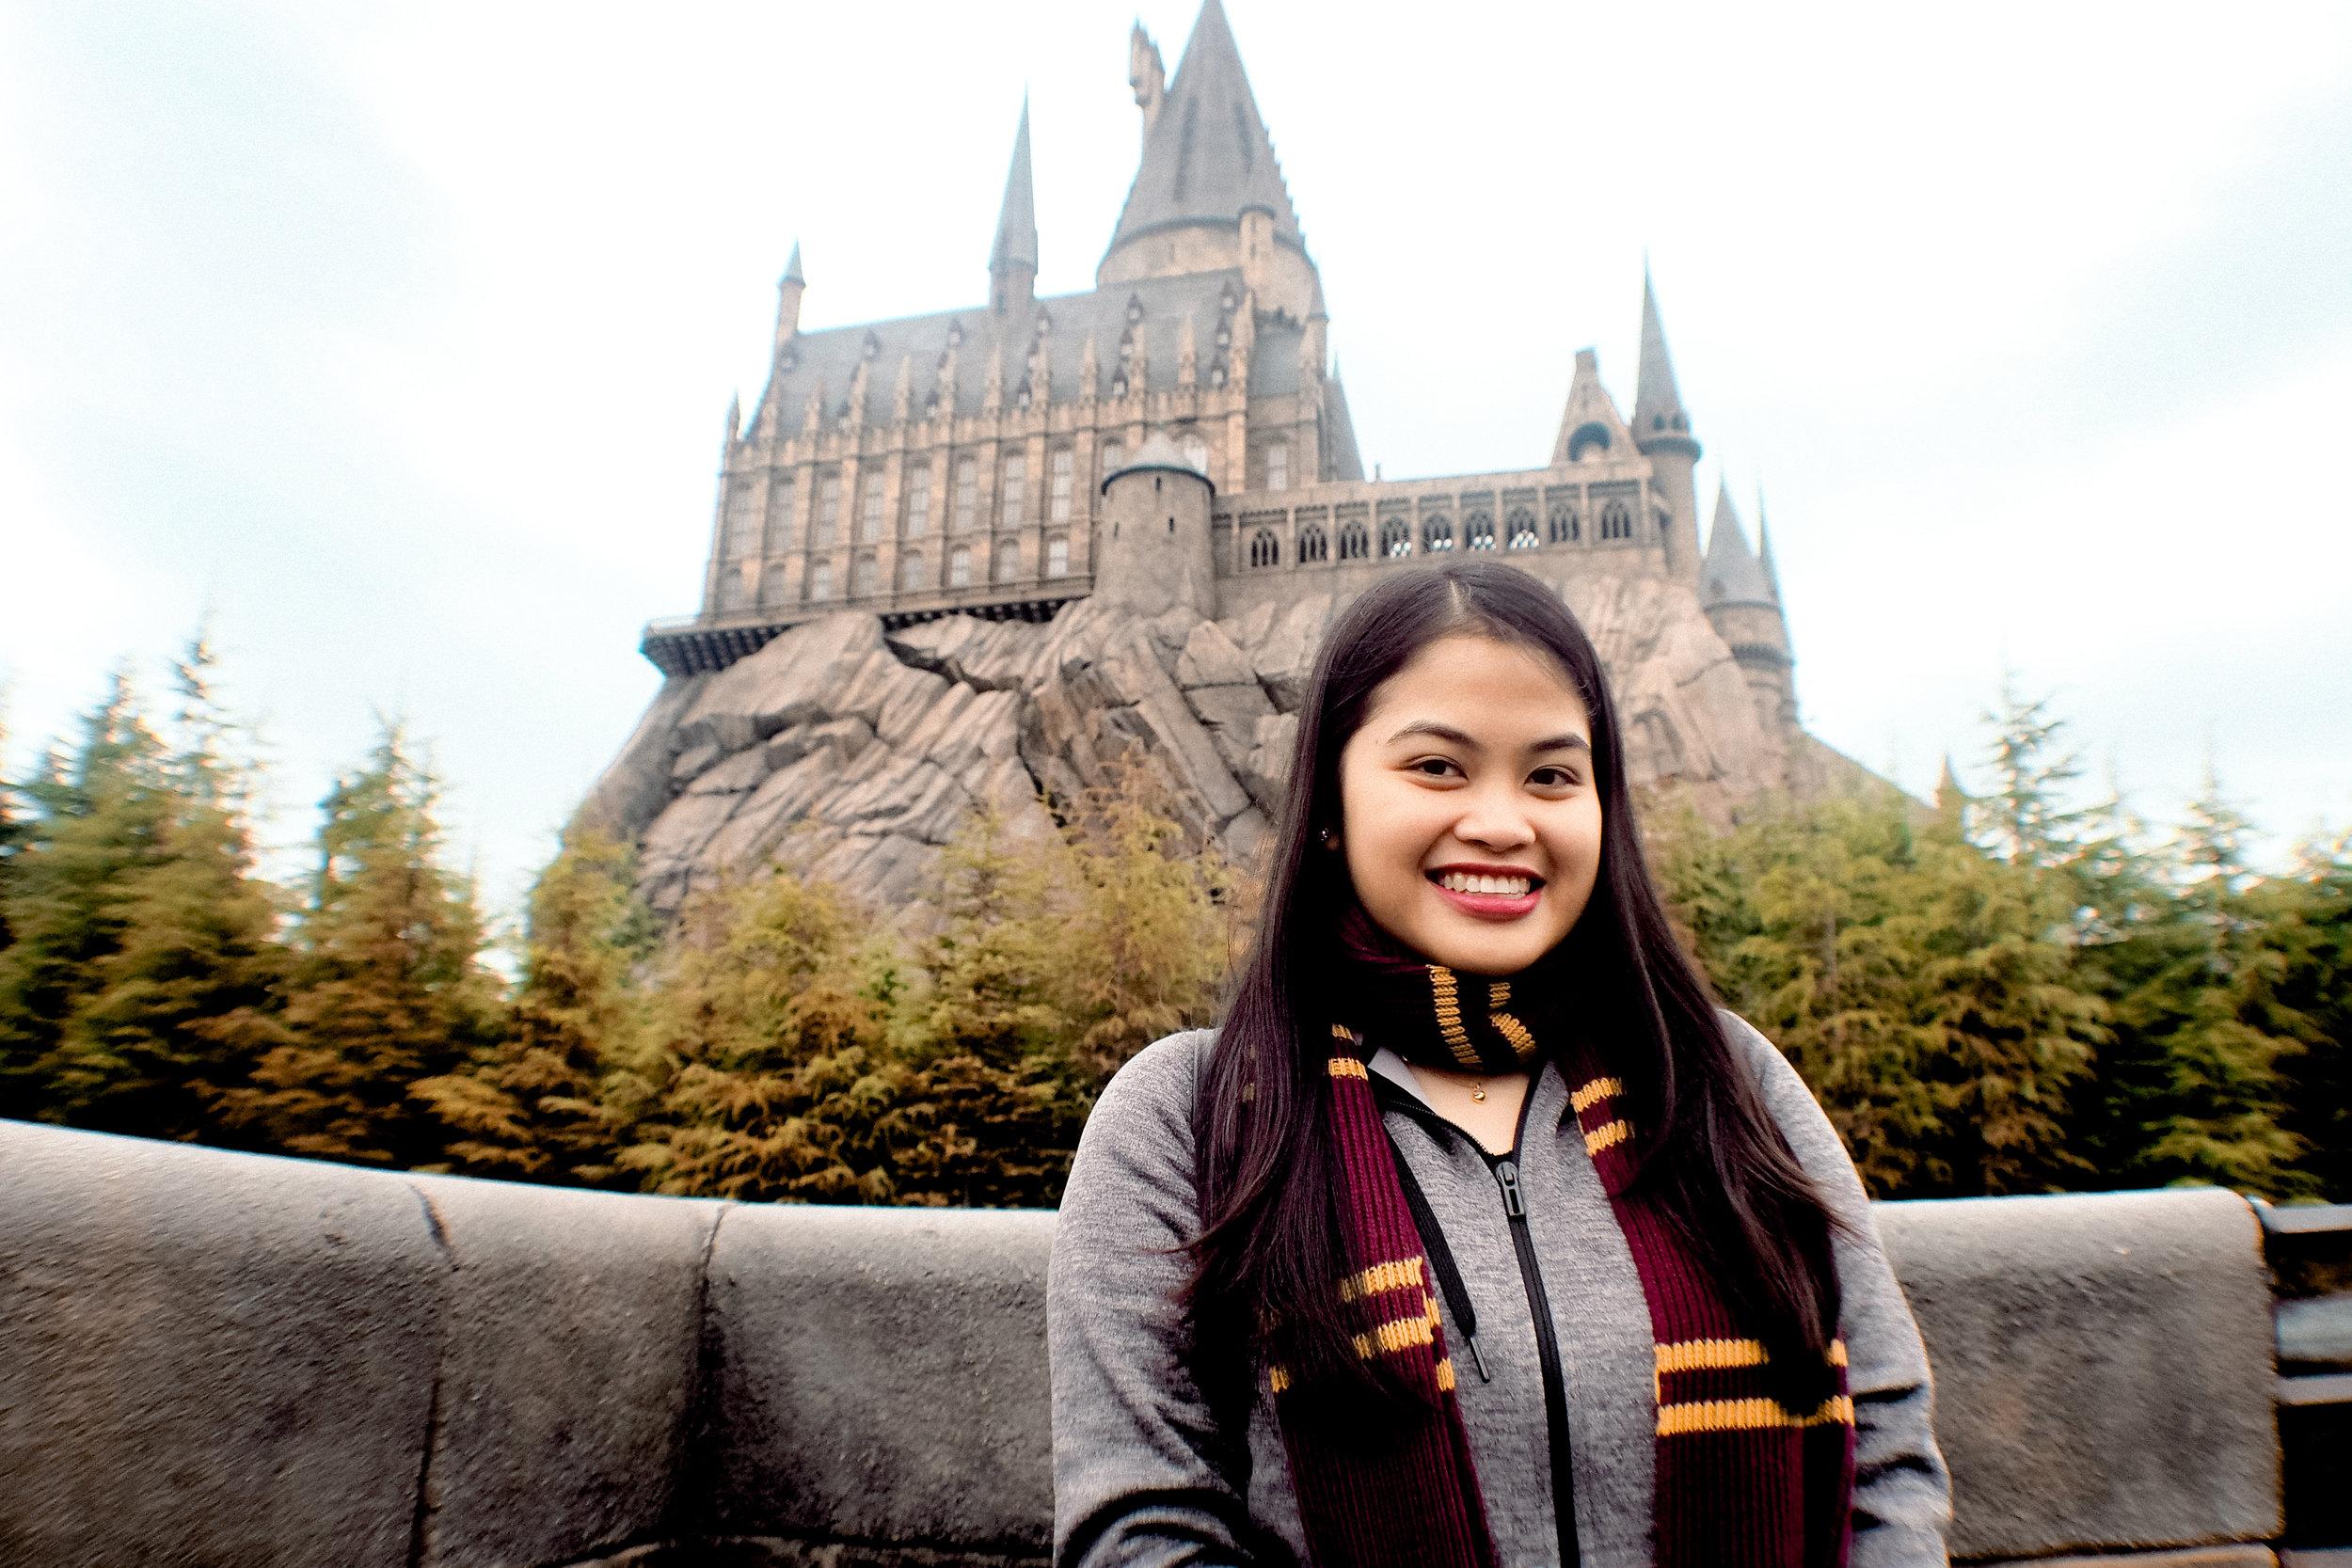 Hogwarts, I'm still waiting for my letter…